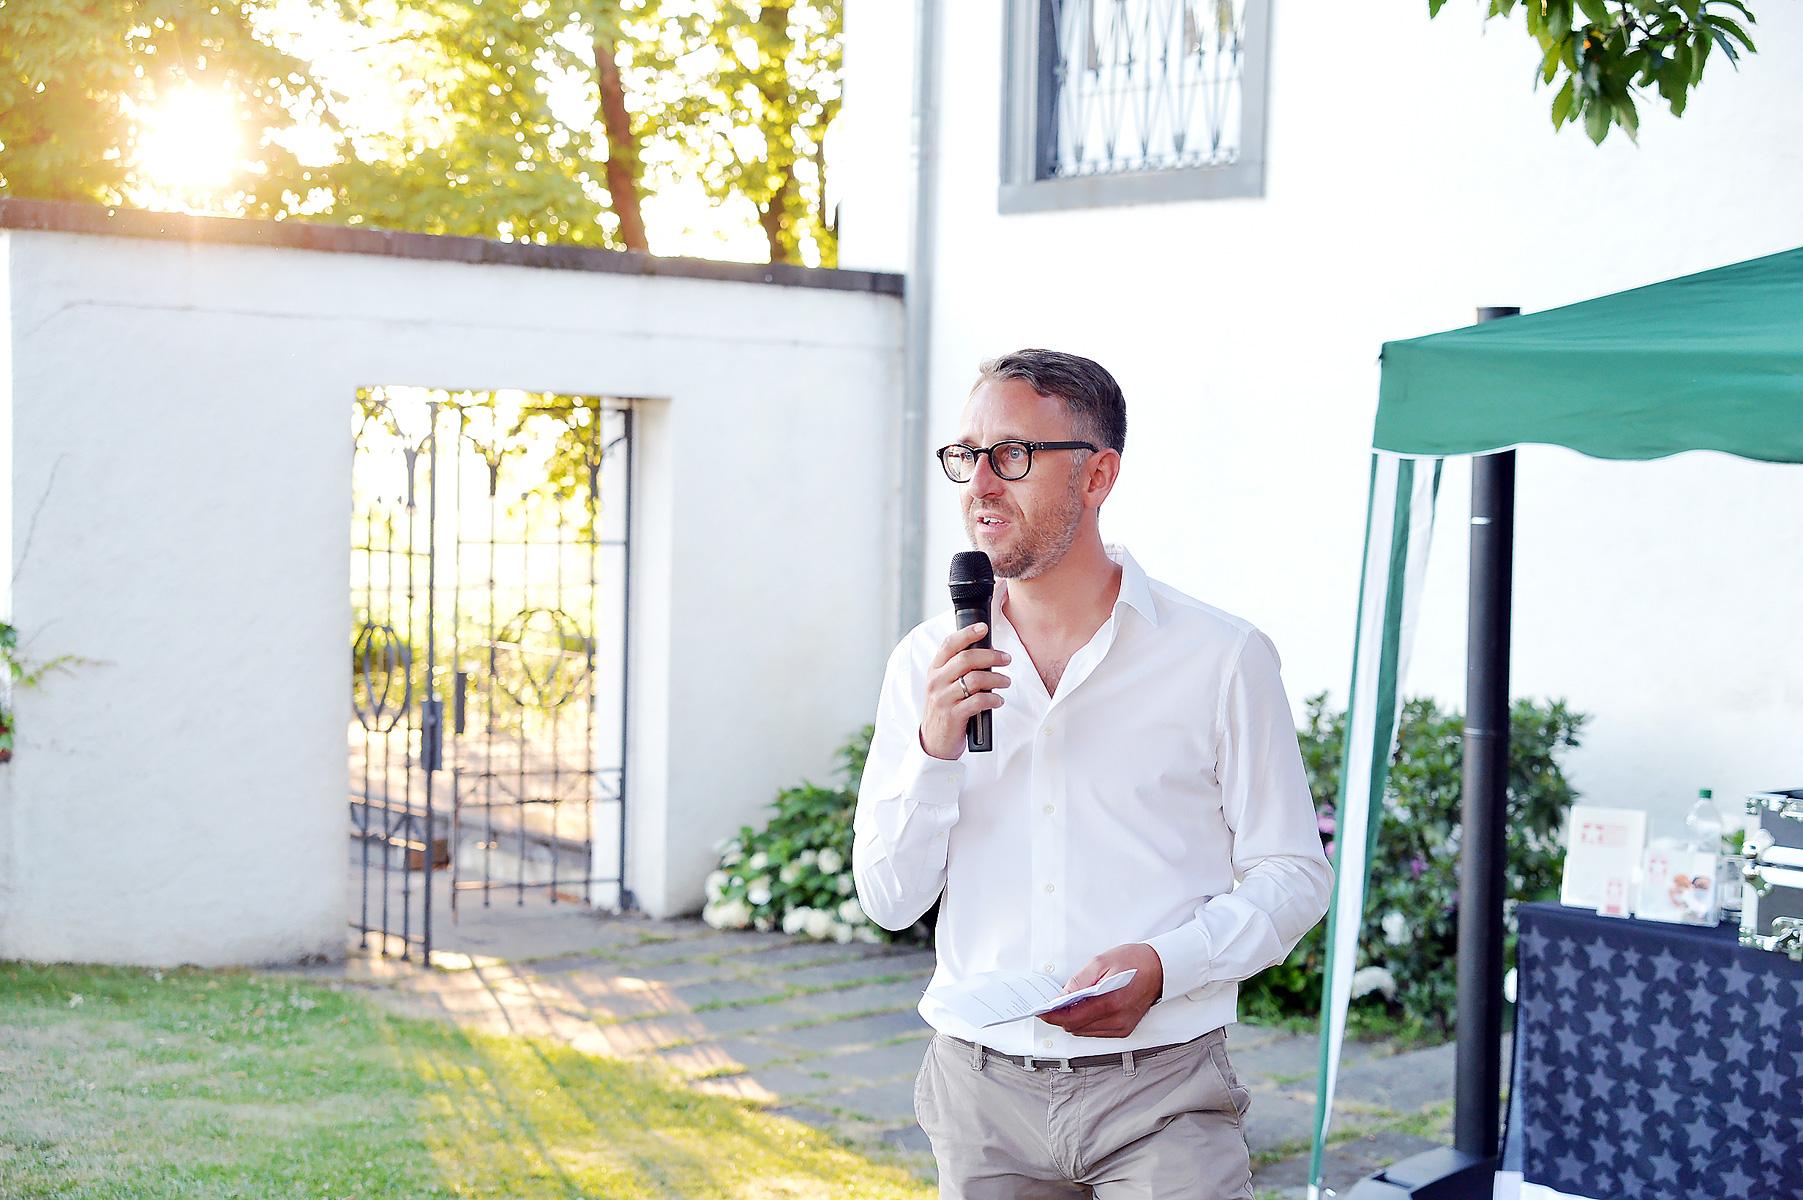 Lions-Club-Klostergut-Besselich-Nicole-Bouillon-Fotografie